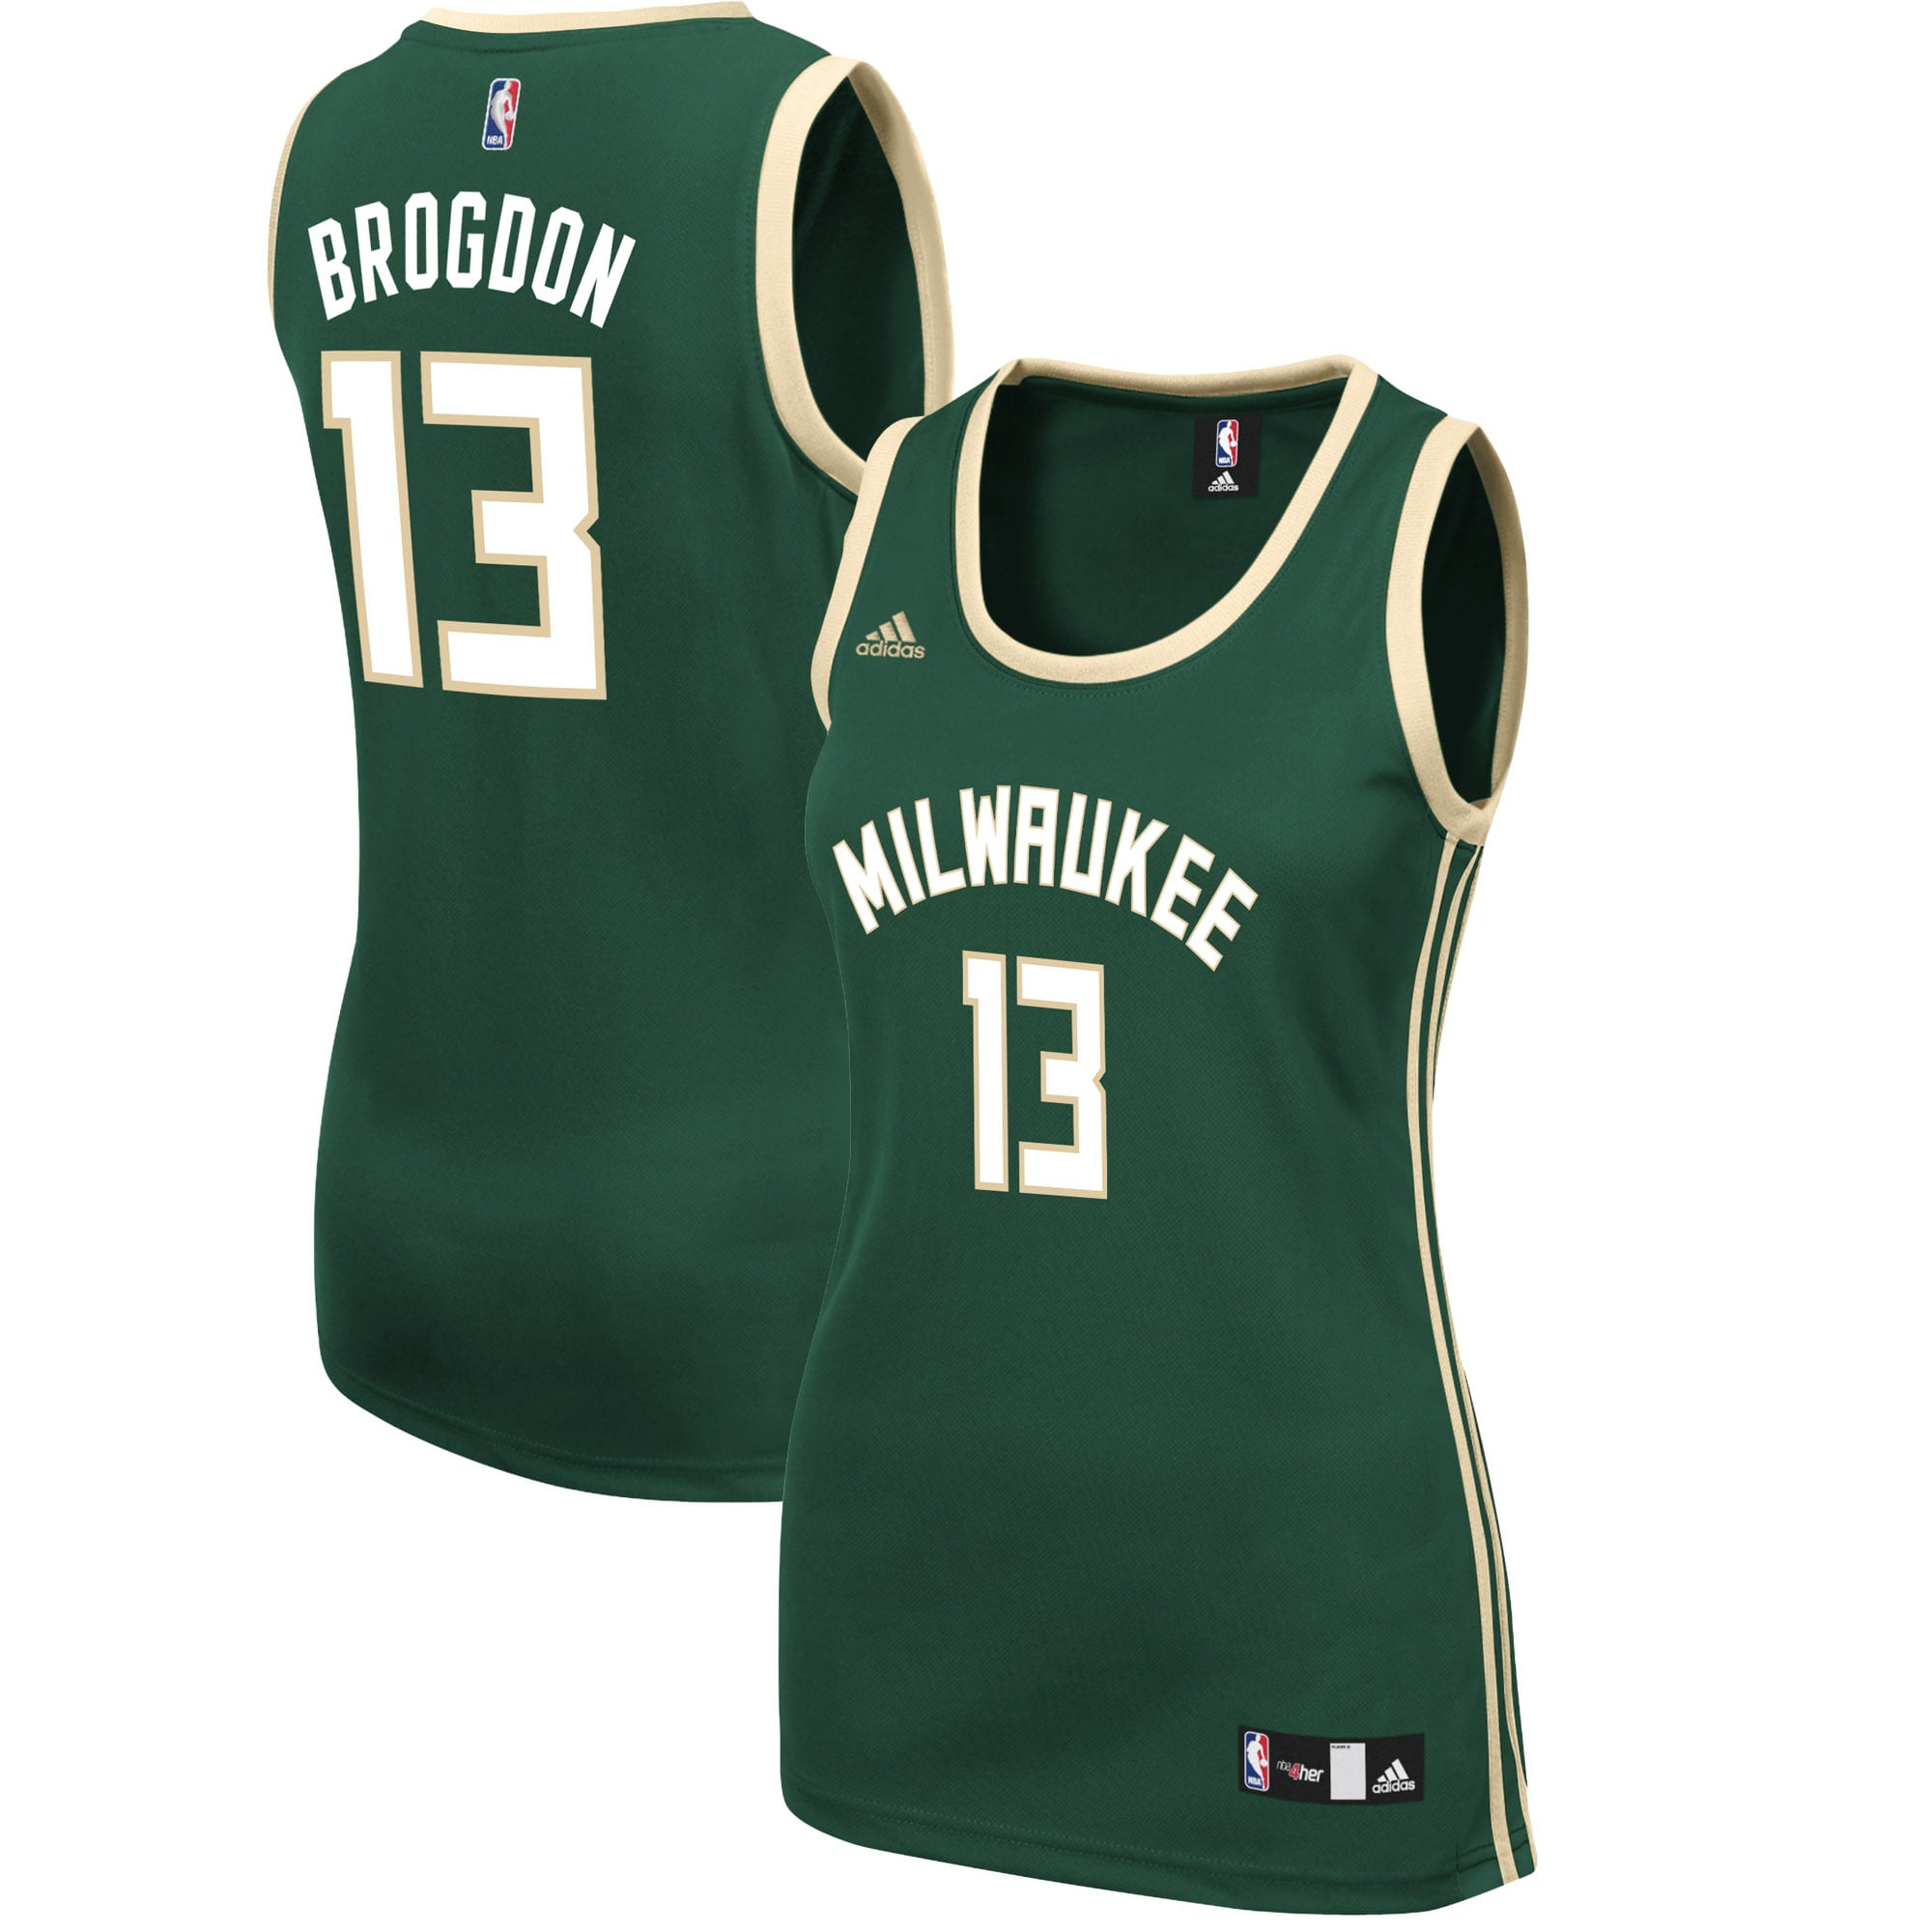 Malcolm Brogdon Milwaukee Bucks adidas Women's Road Replica Jersey - Hunter Green